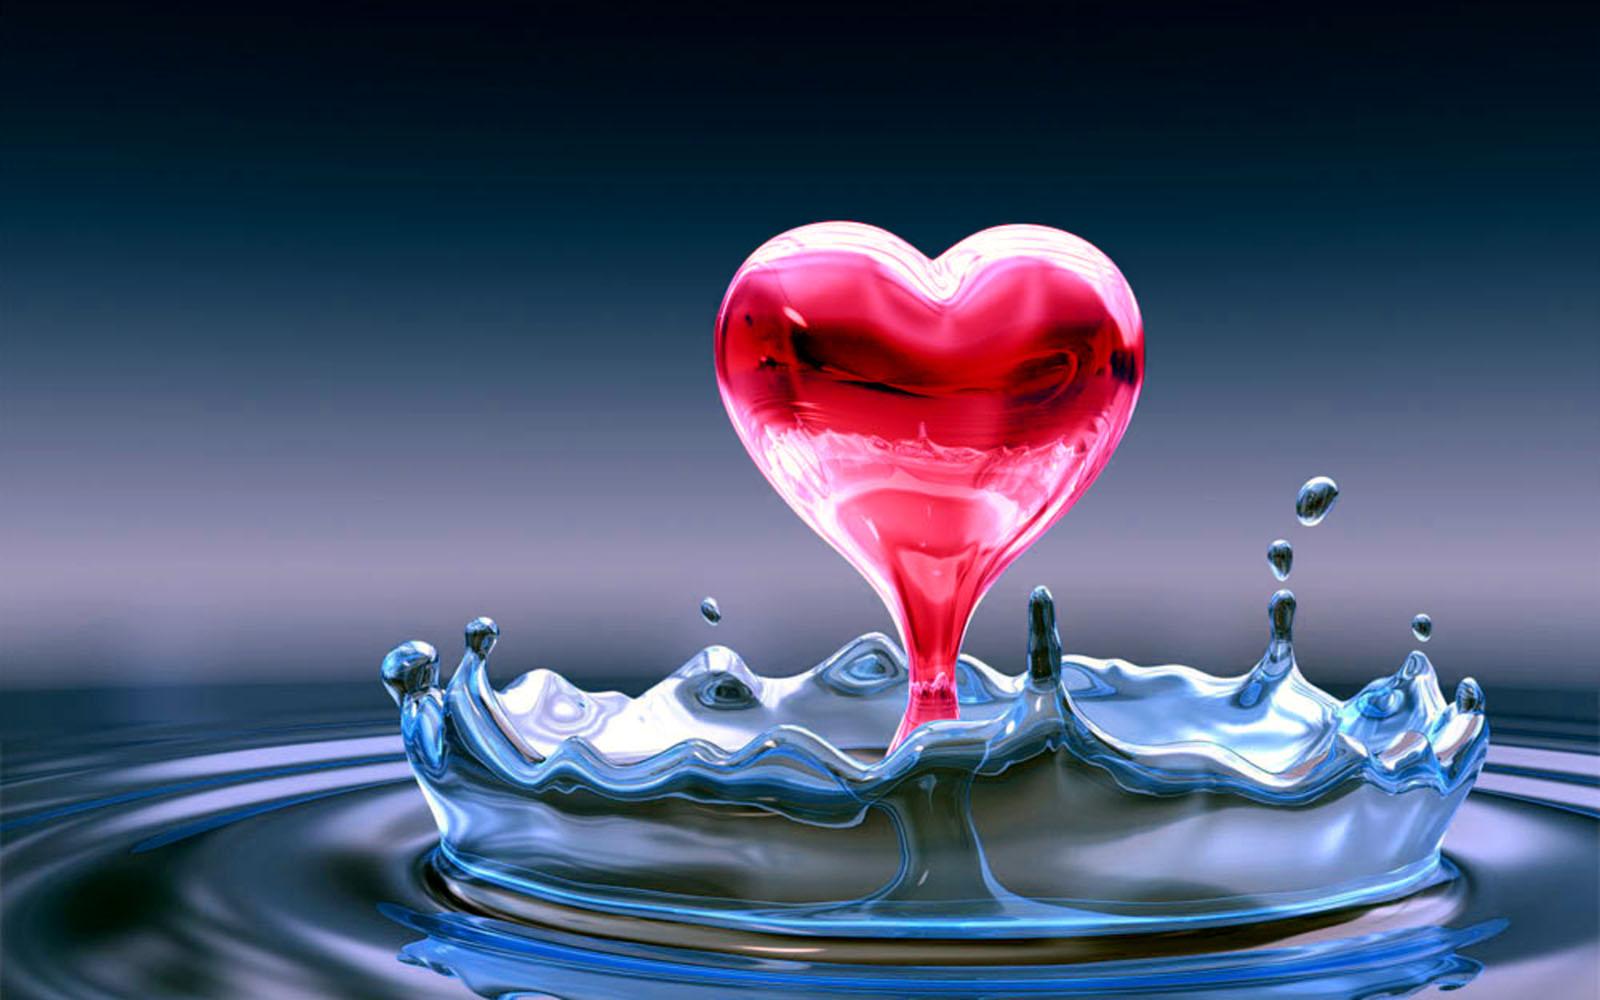 Wallpaper download hd love - Wallpaper Download Hd Love 52